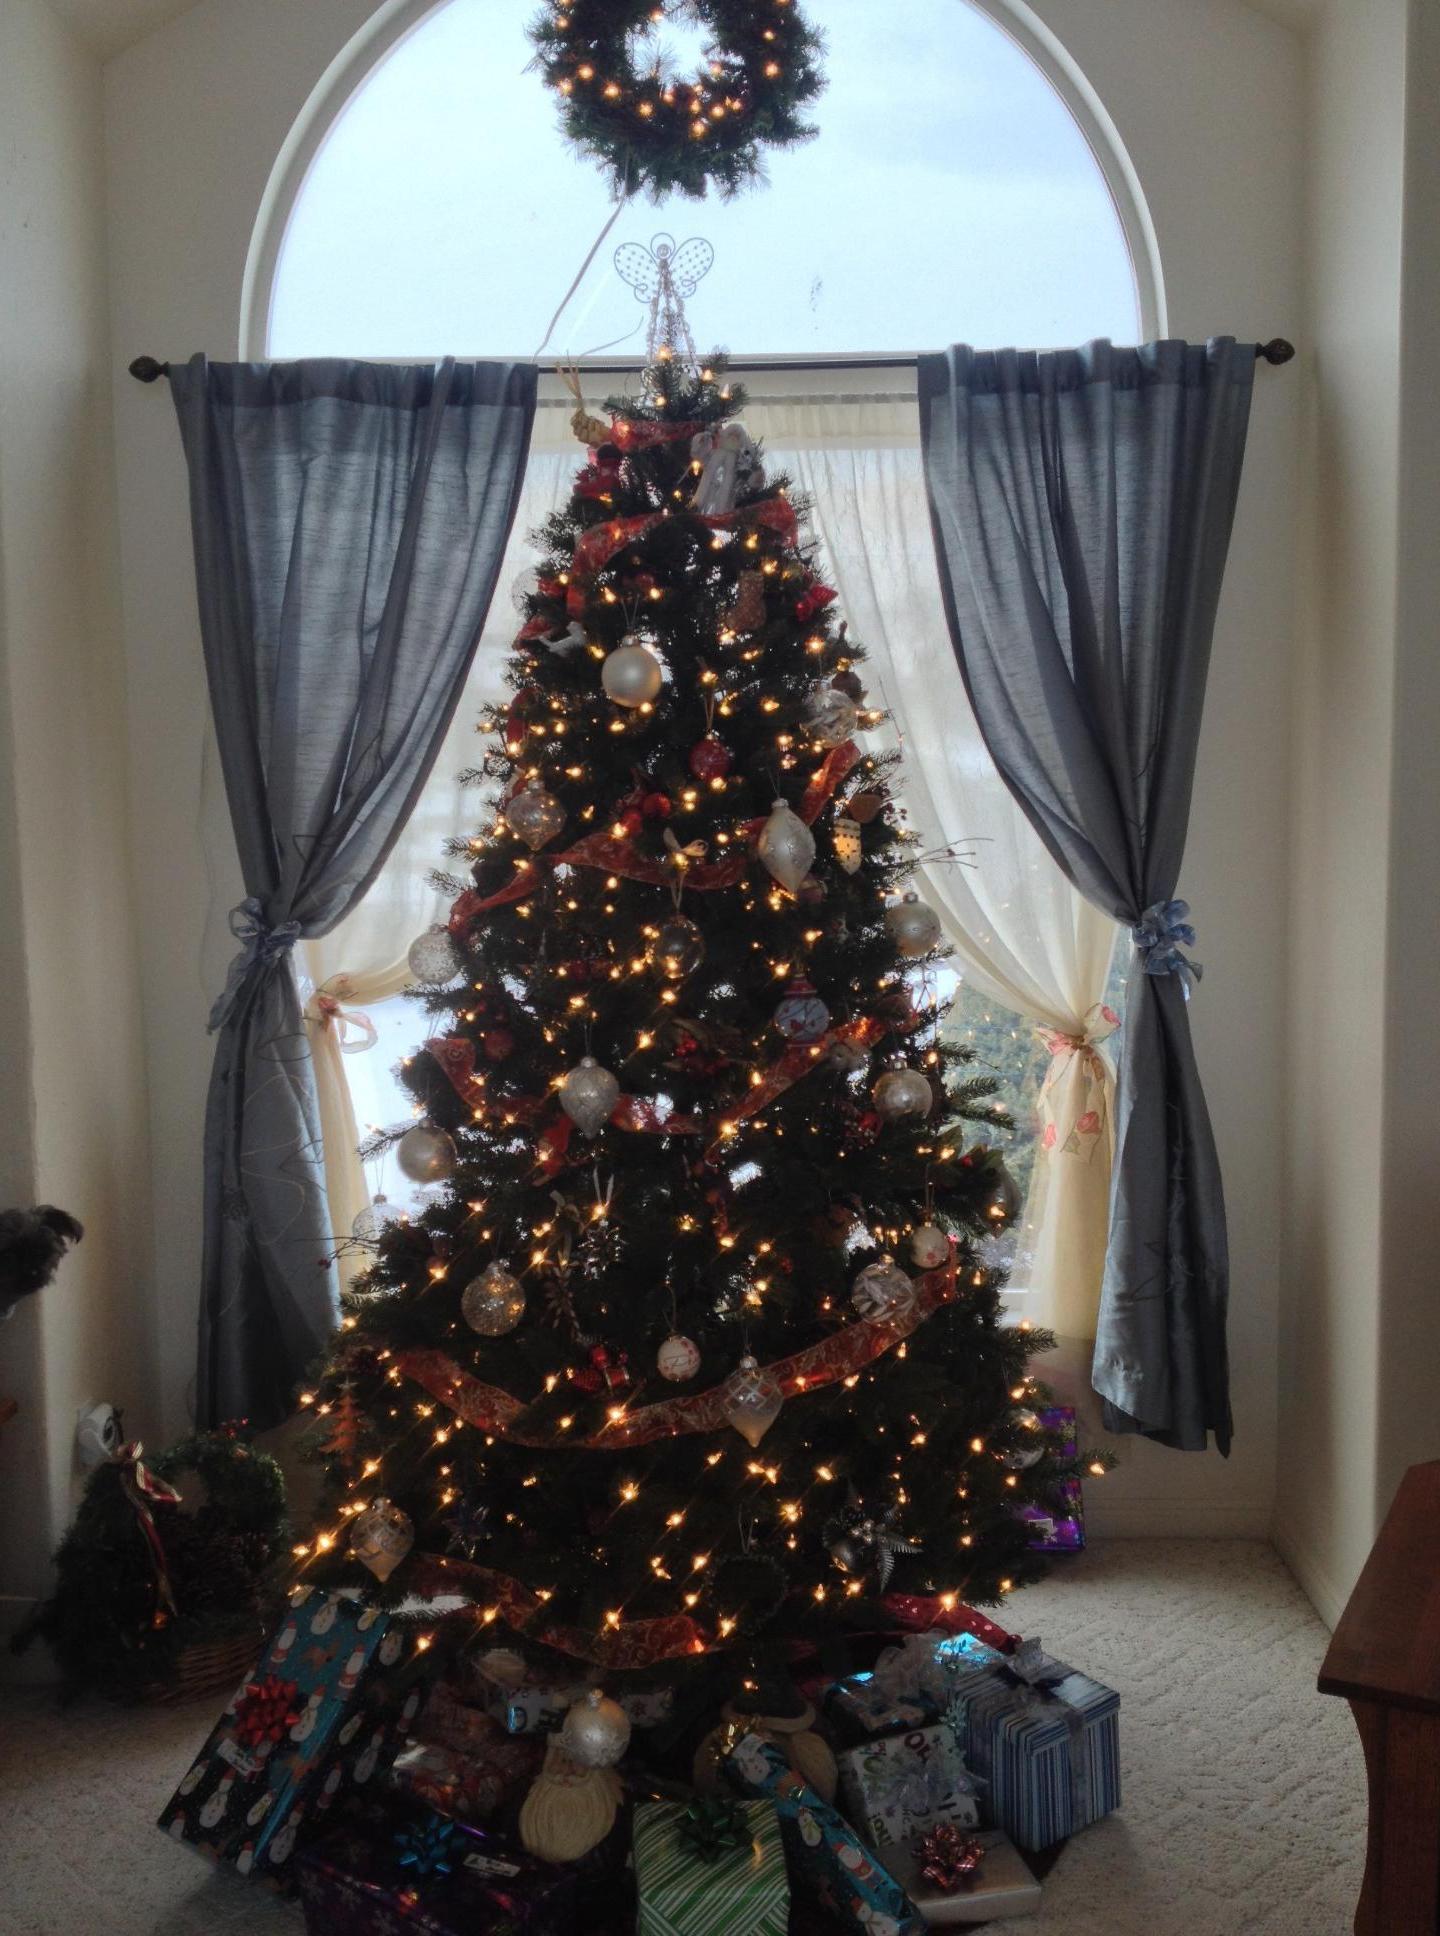 Christmas Tree Display_1475729564265.jpg